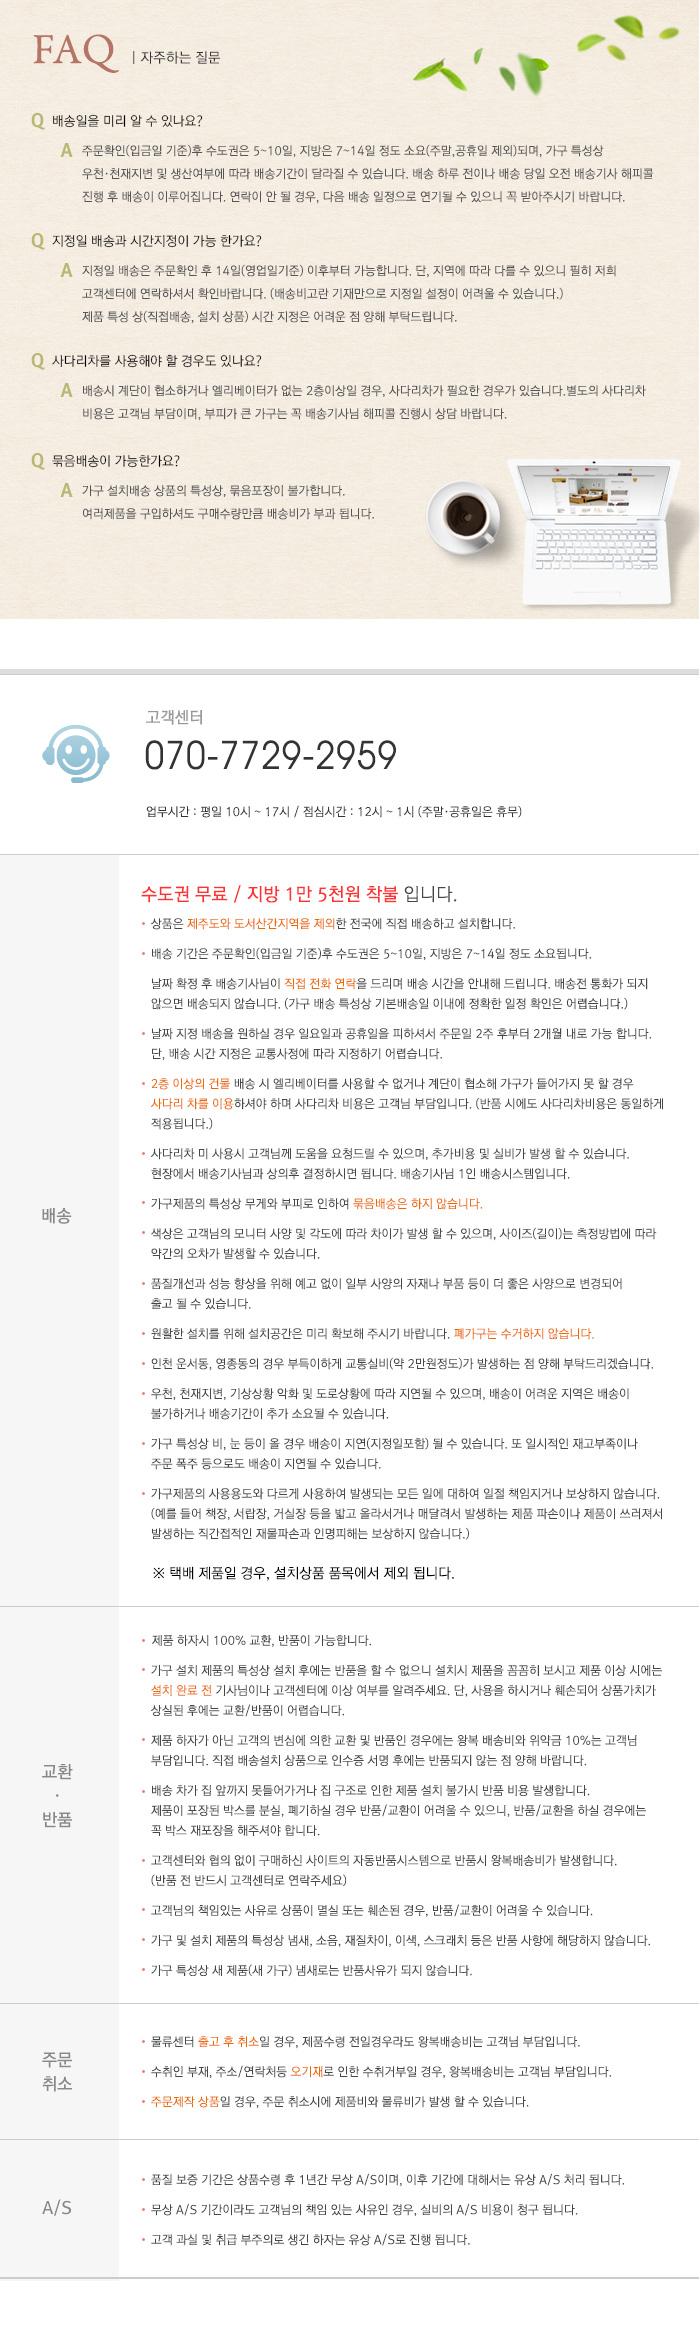 Dazon smart 다용도 서랍 500 - 로쏘, 159,530원, 수납/선반장, 수납장